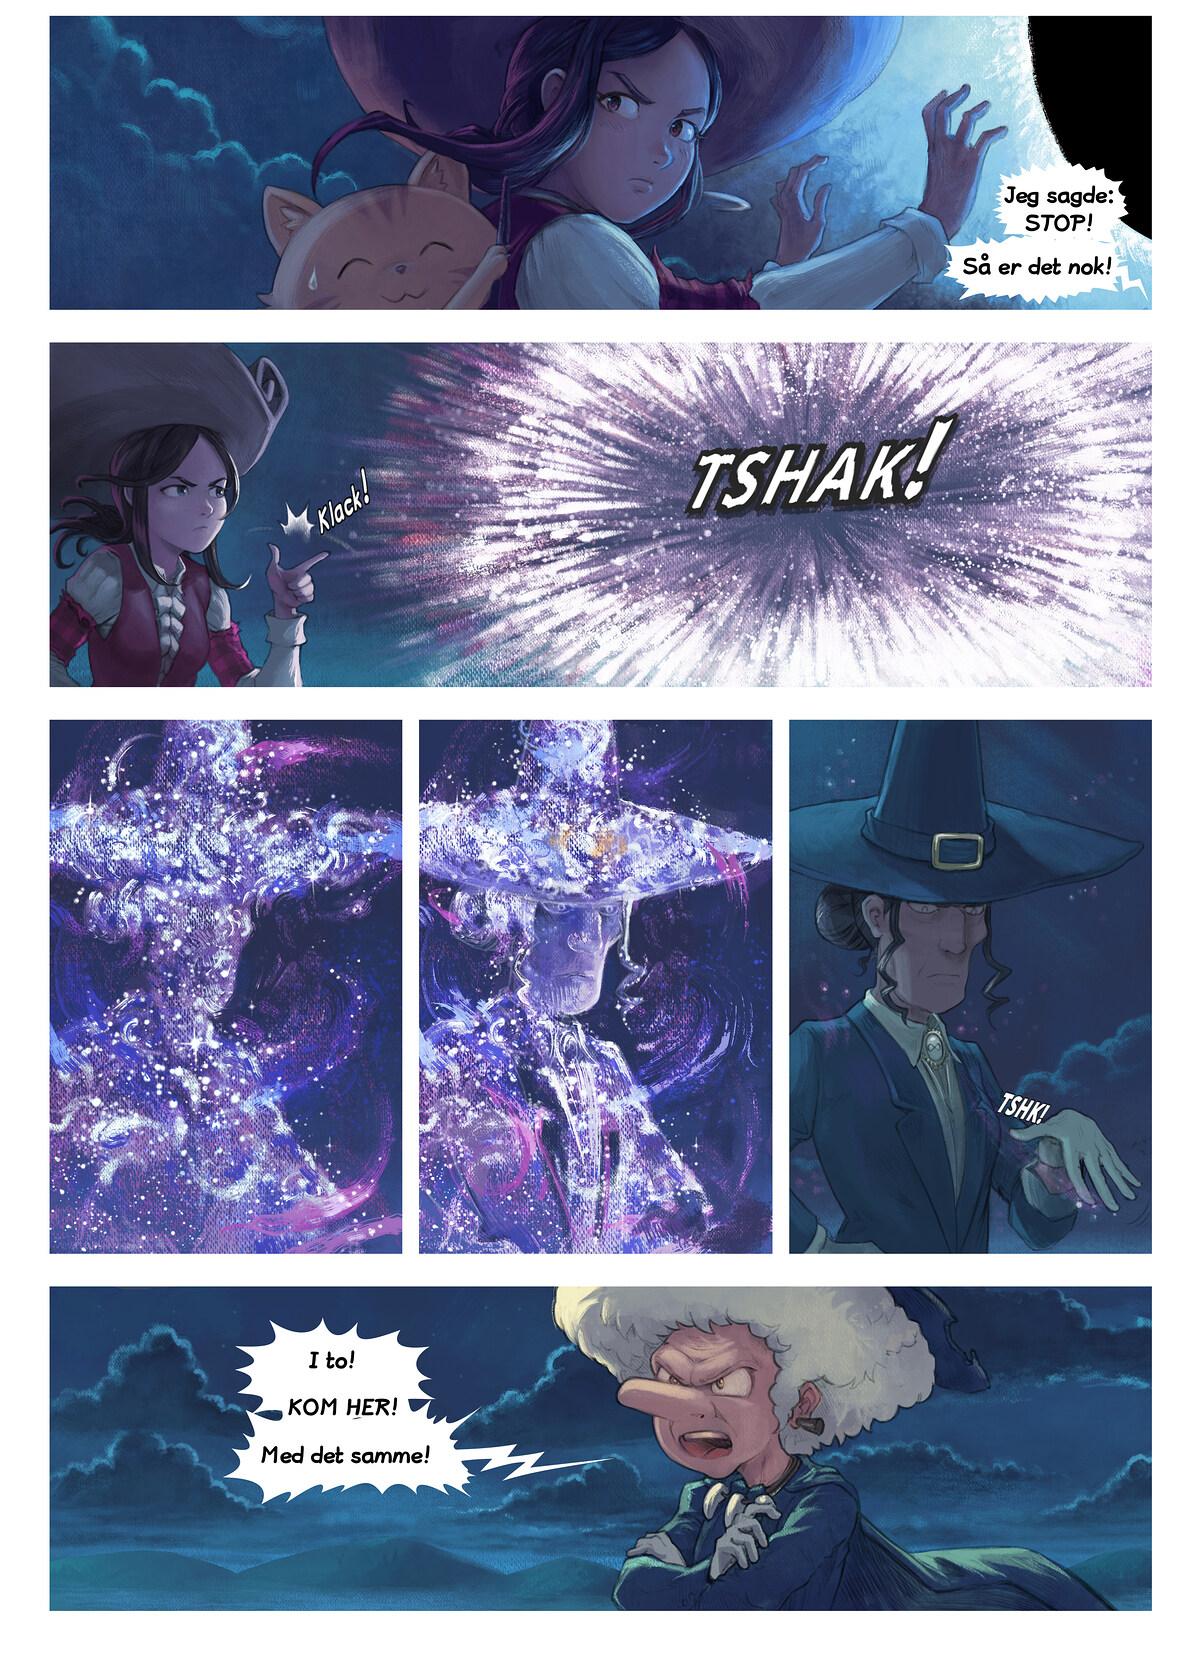 Episode 31: Kampen, Page 6